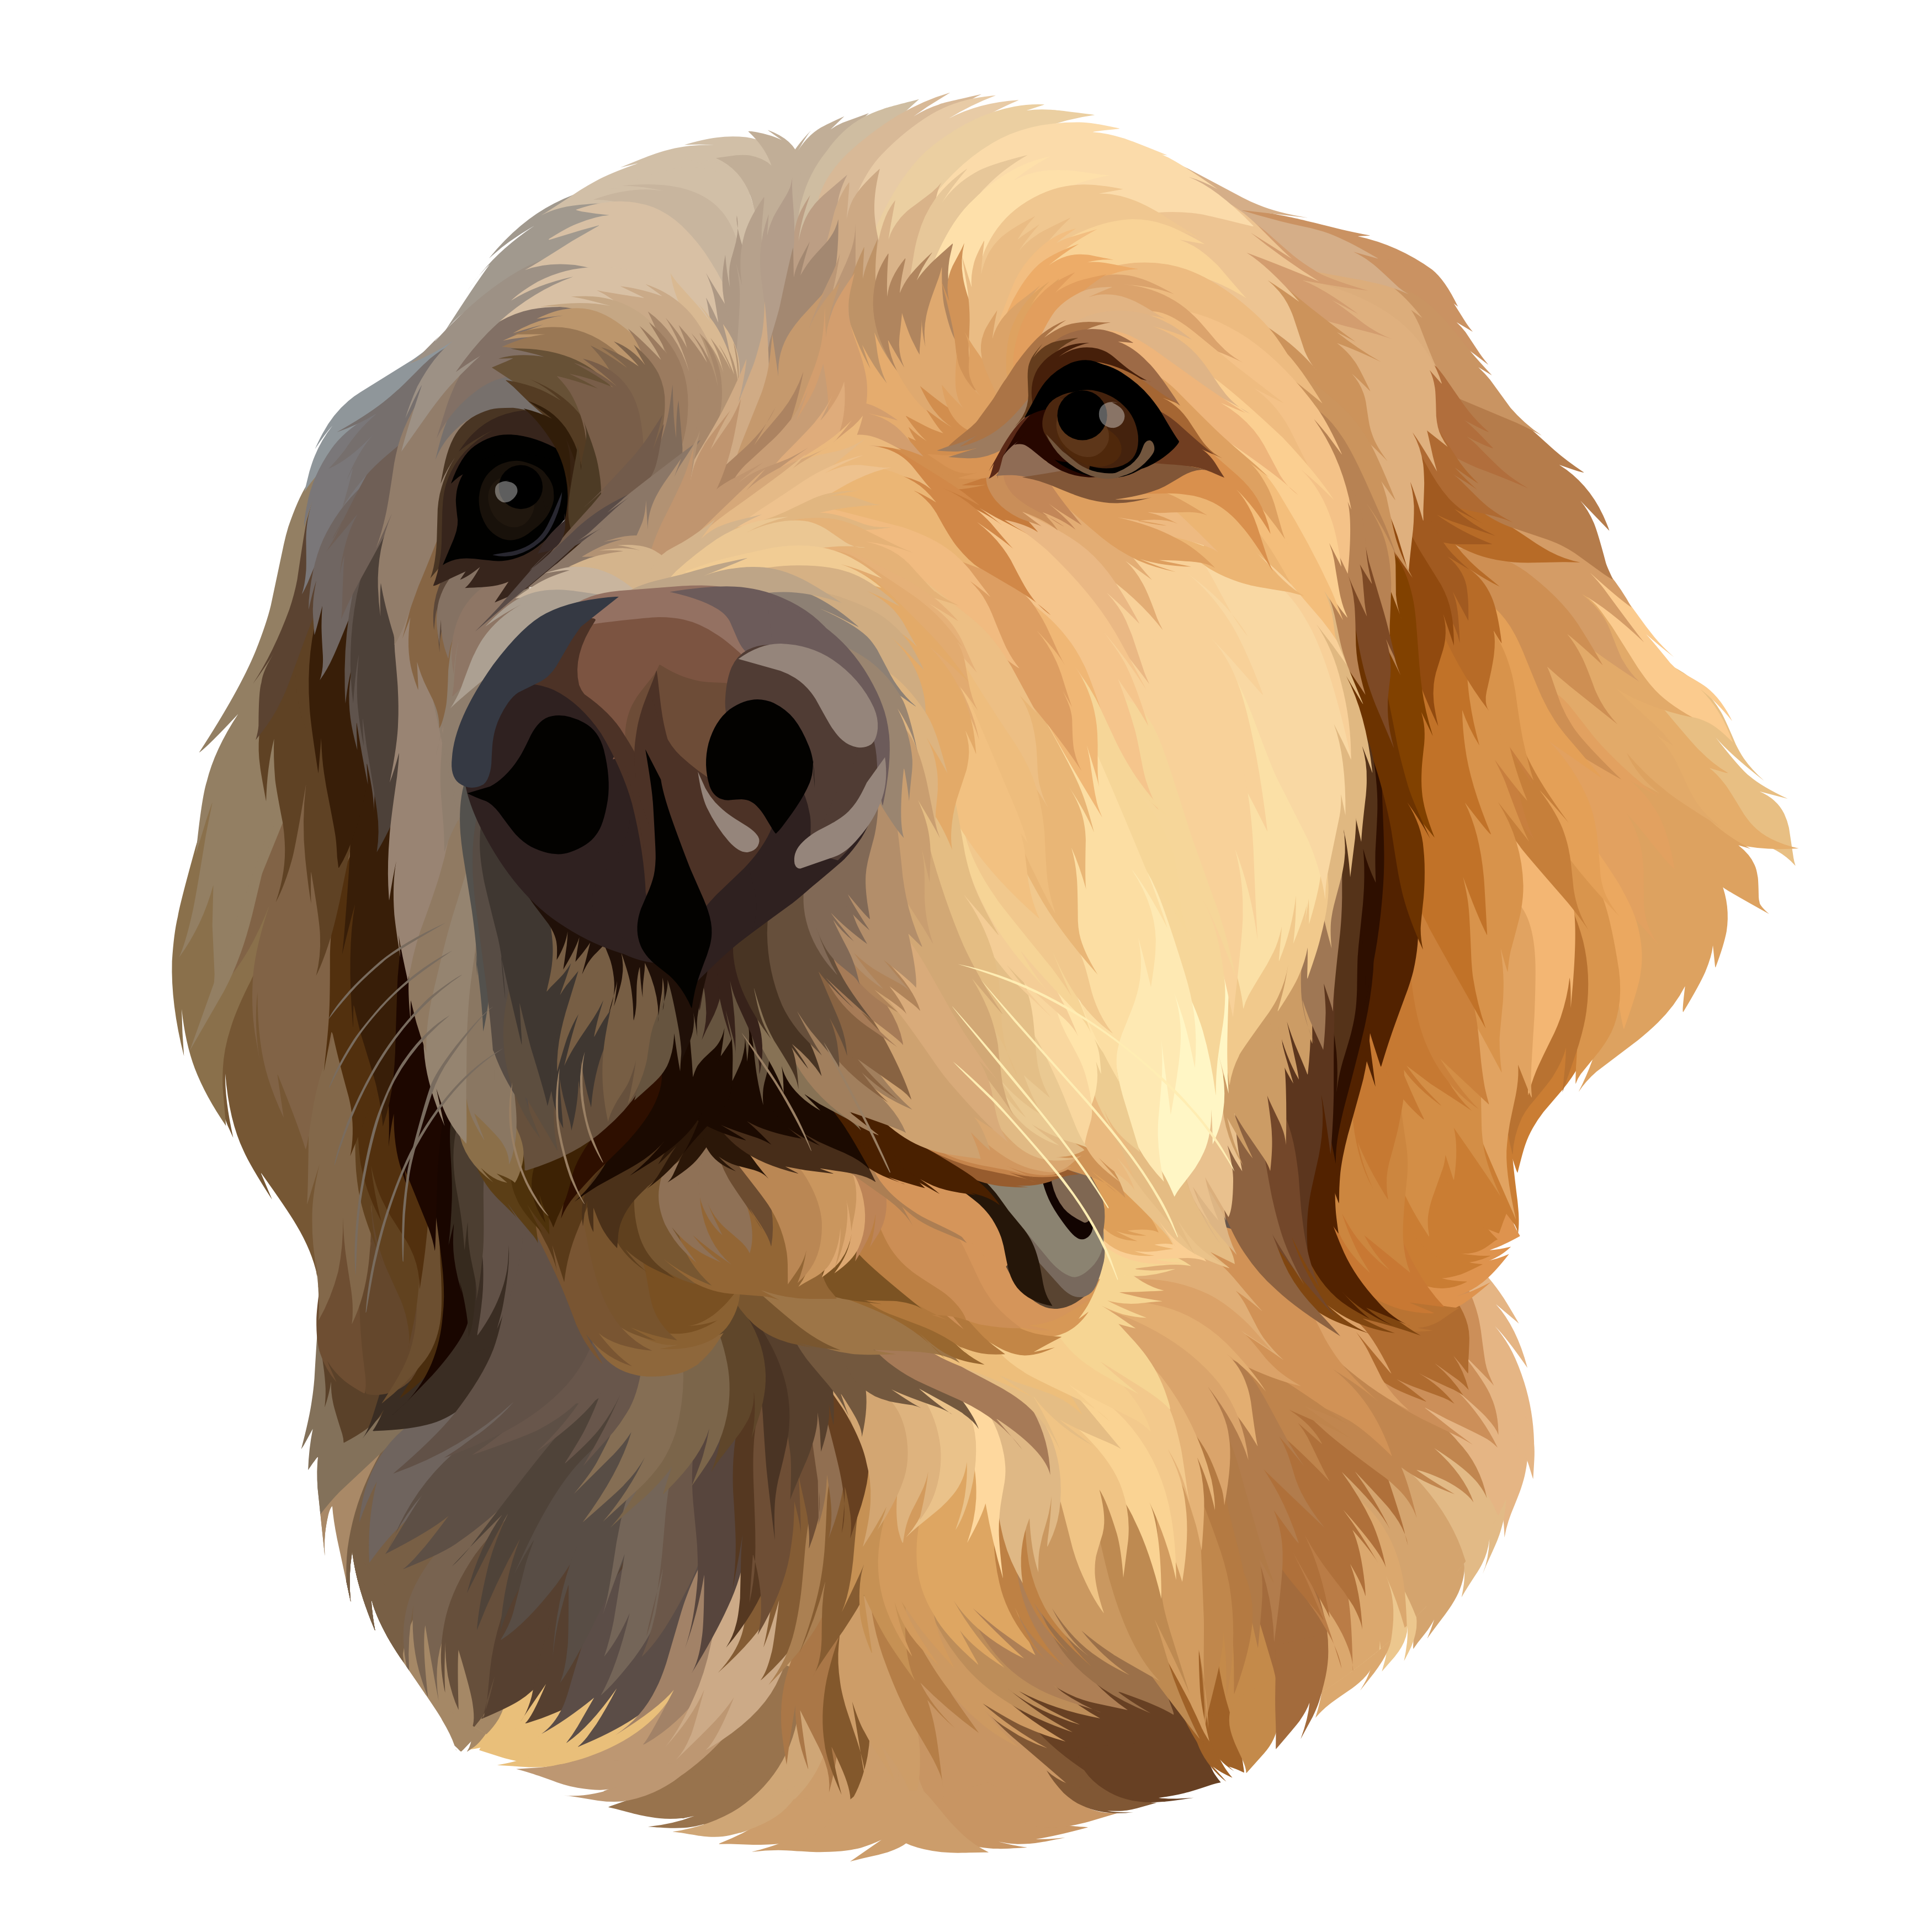 Golden Retriever Clipart Vector 59 Dog Silhouette Silhouette Png Silhouette